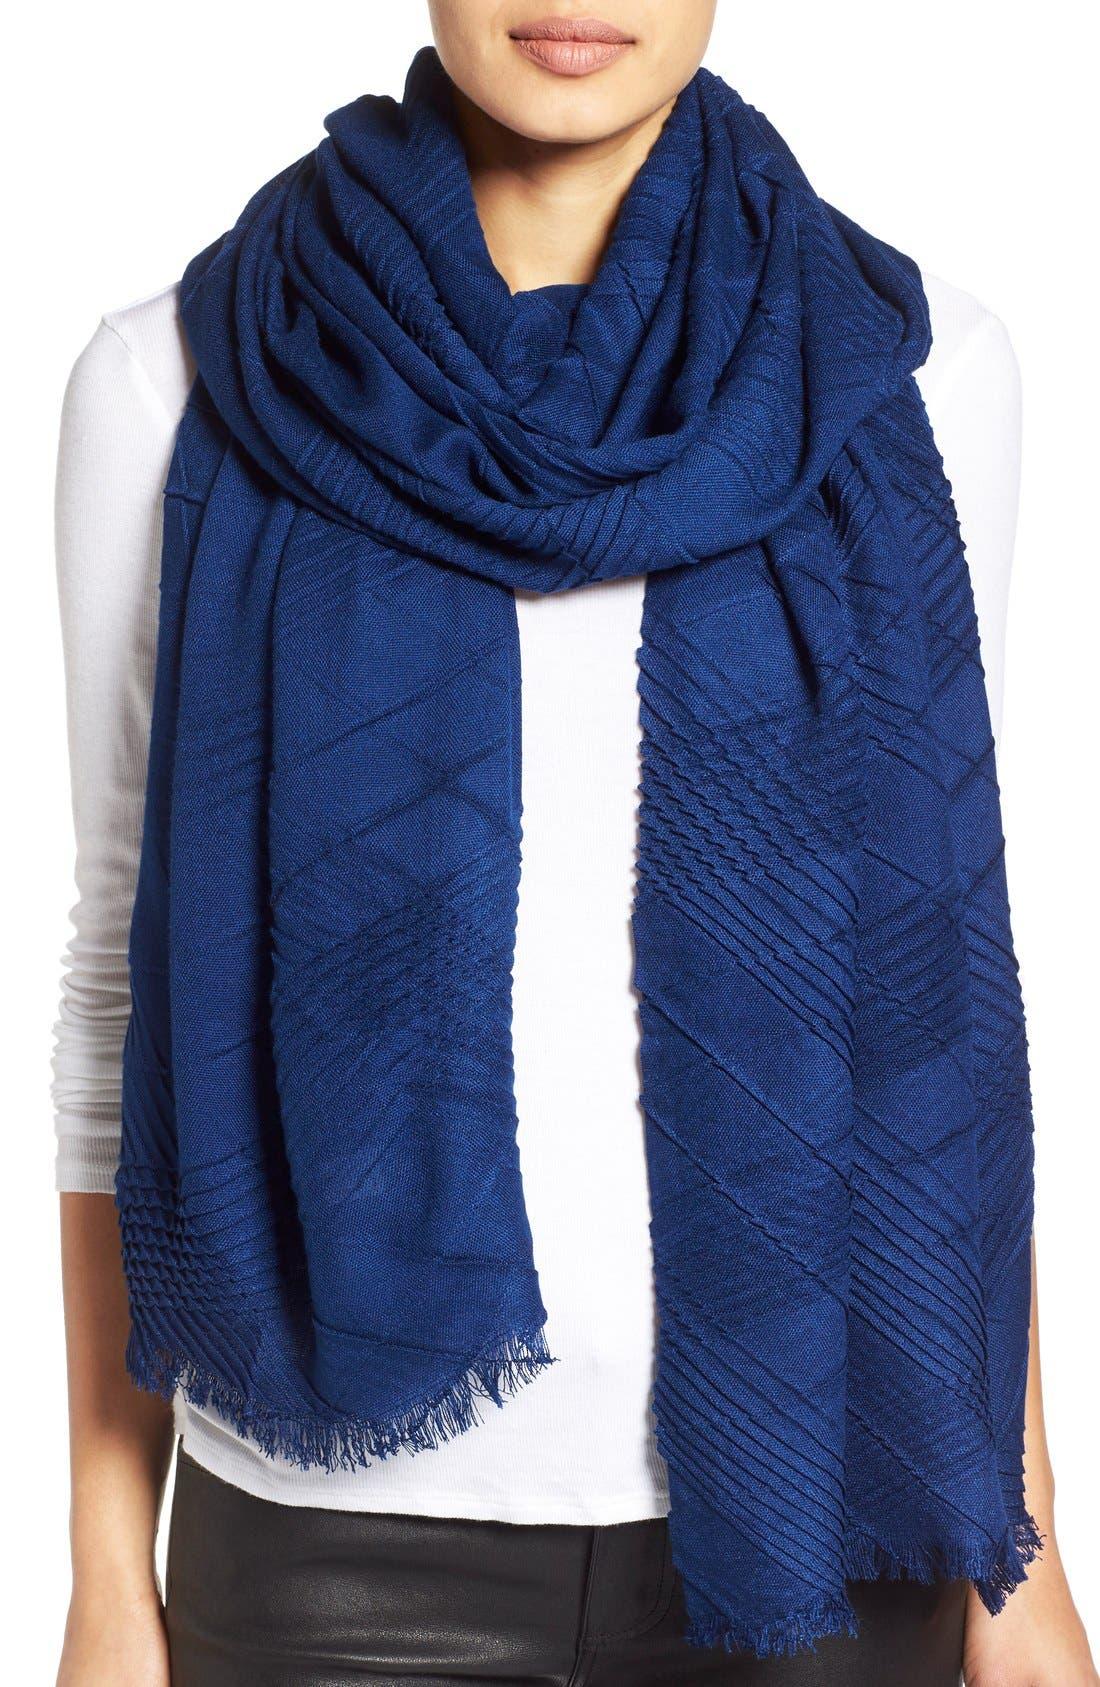 Alternate Image 1 Selected - Echo Pleated Blanket Scarf